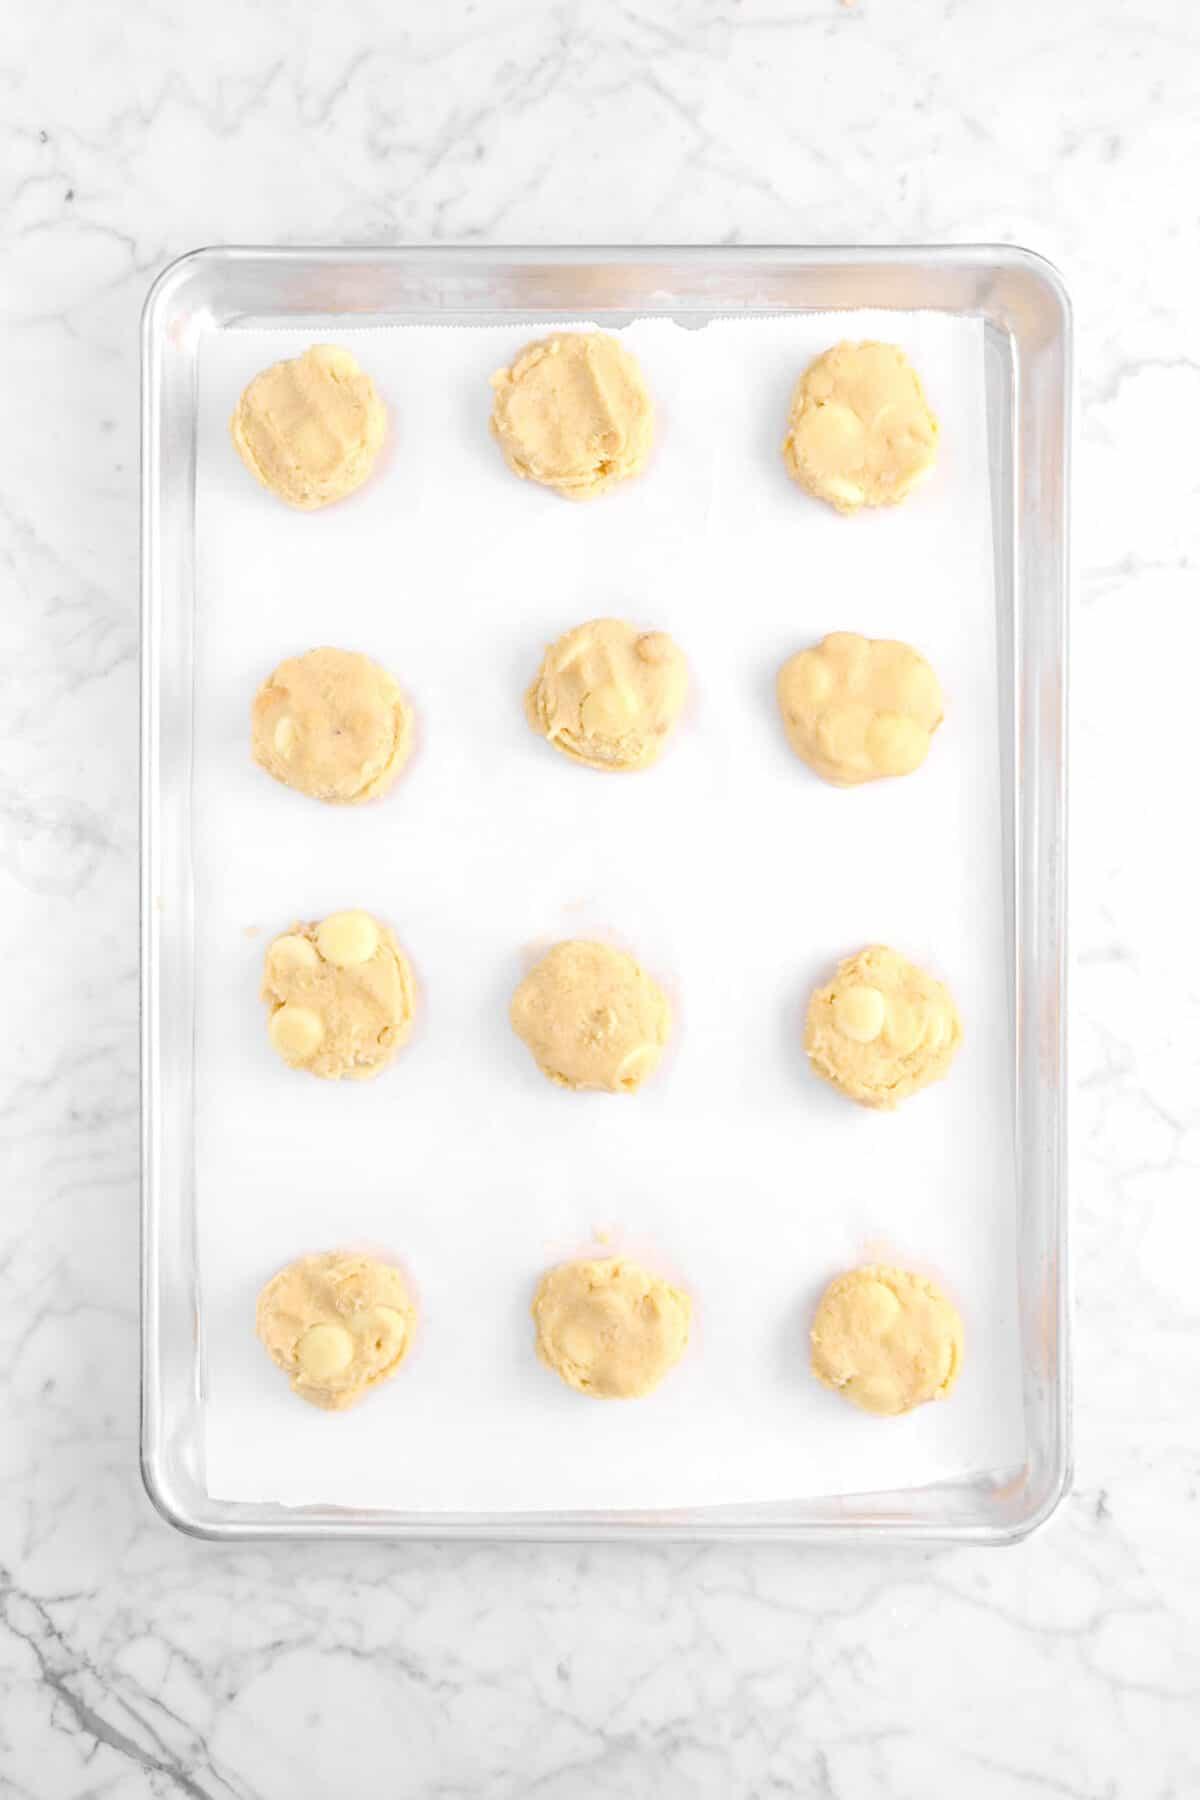 twelve unbaked cookies on a lined sheet pan